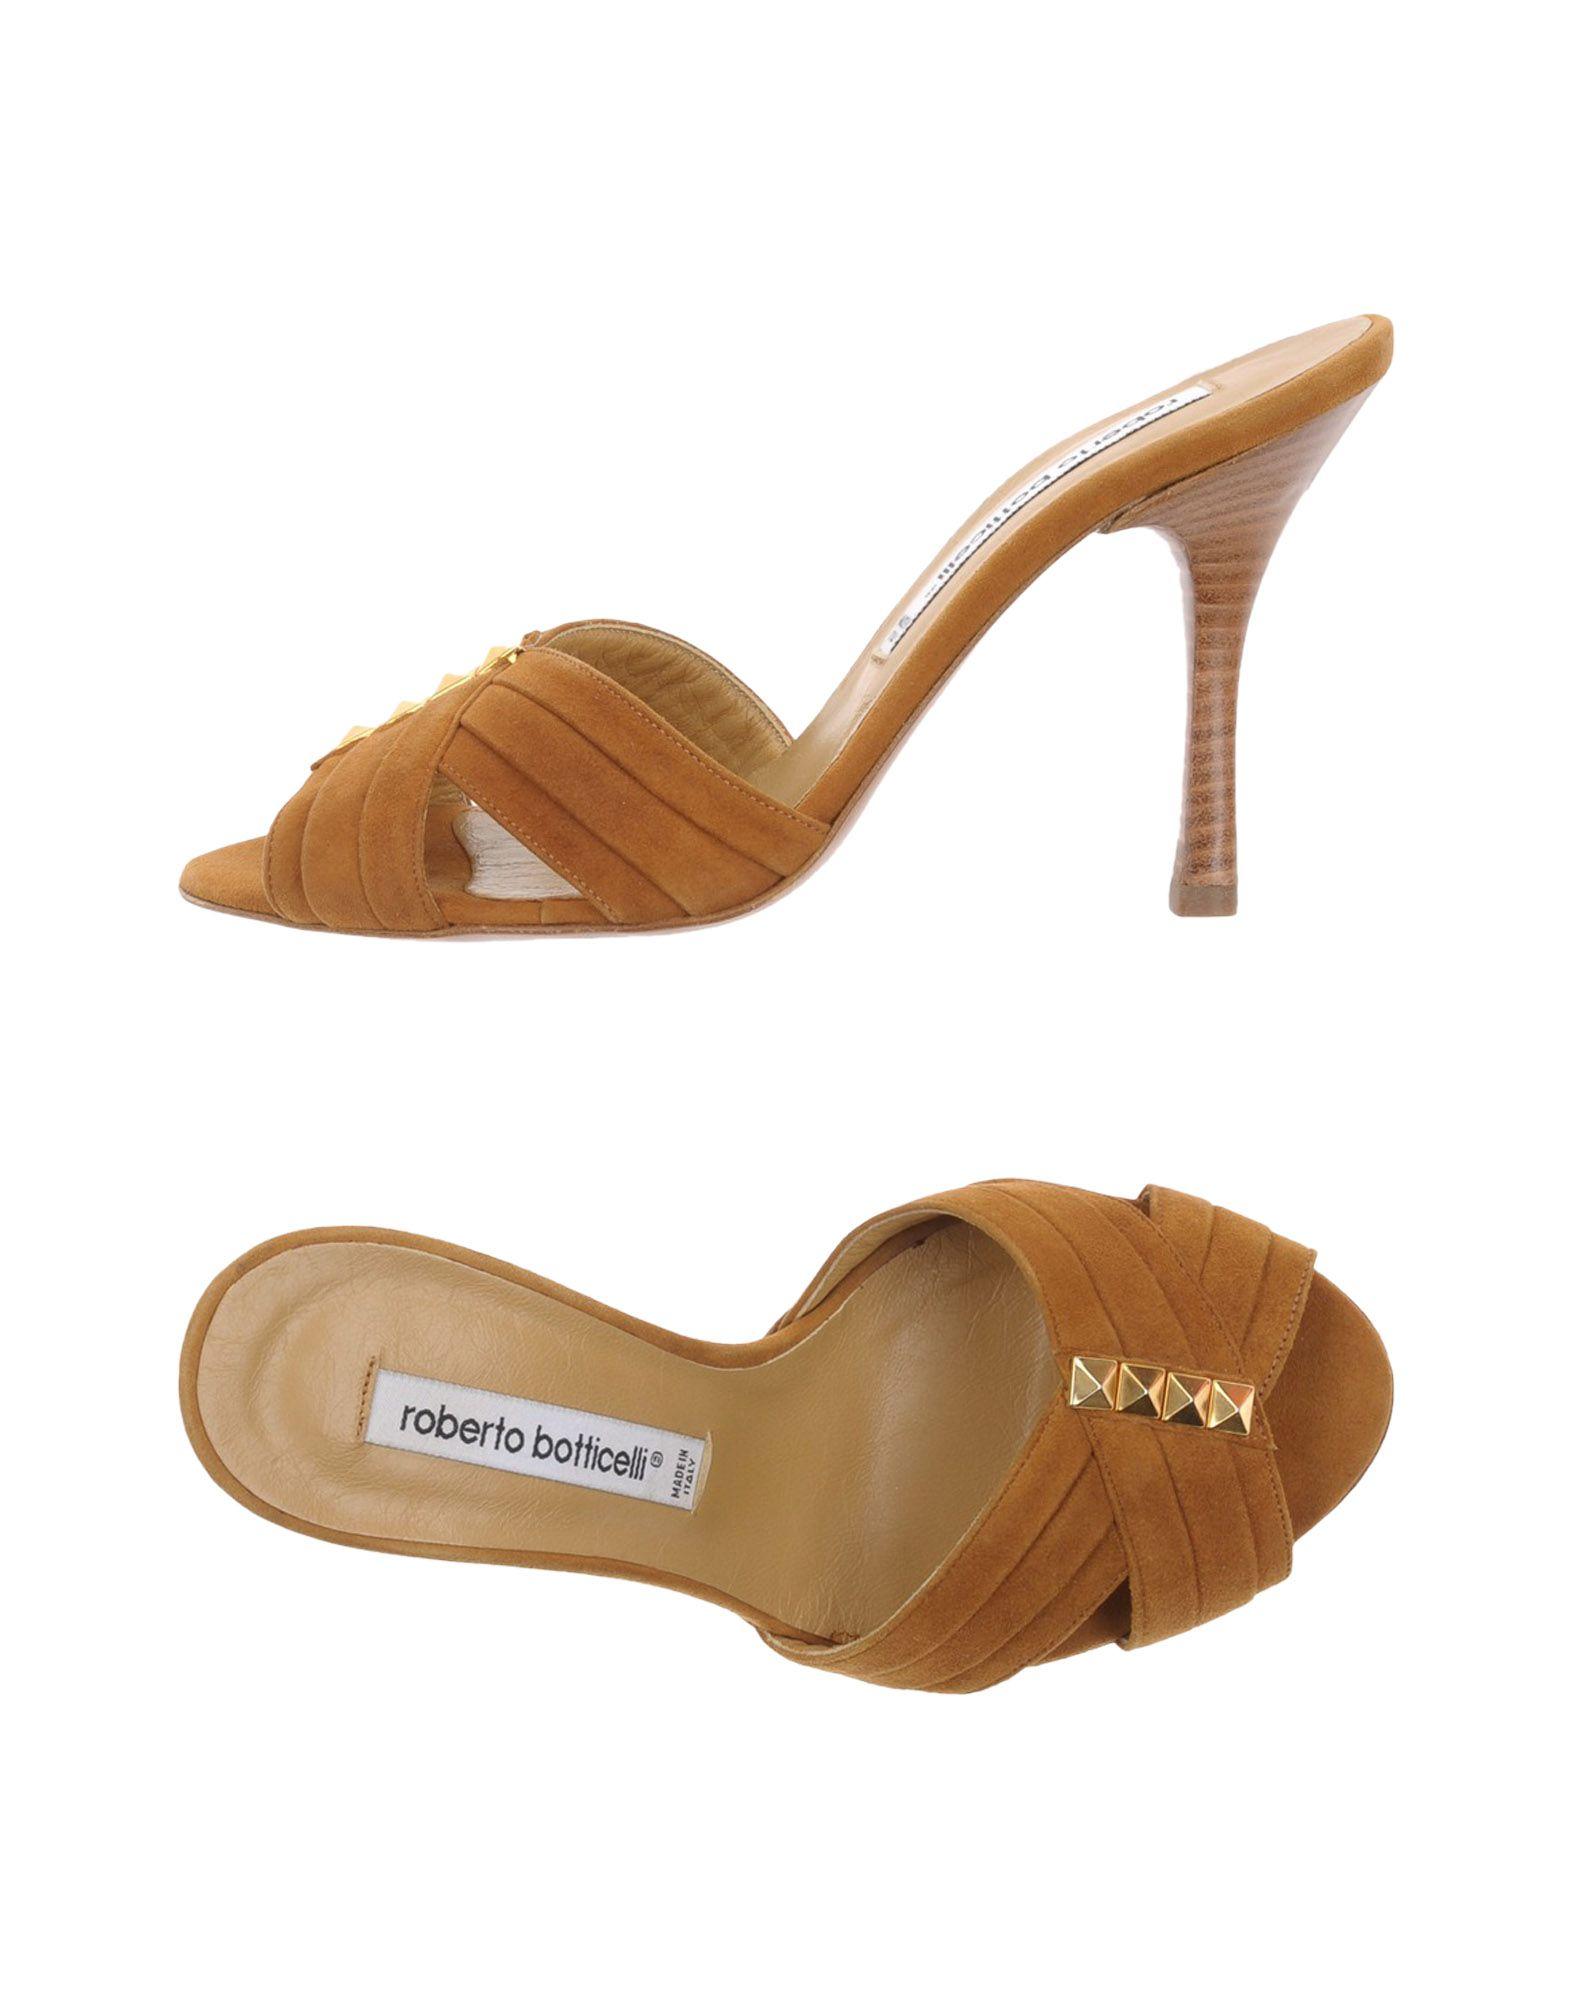 BOTTICELLI SPORT LIMITED Сандалии спортивные сандалии sport shoes